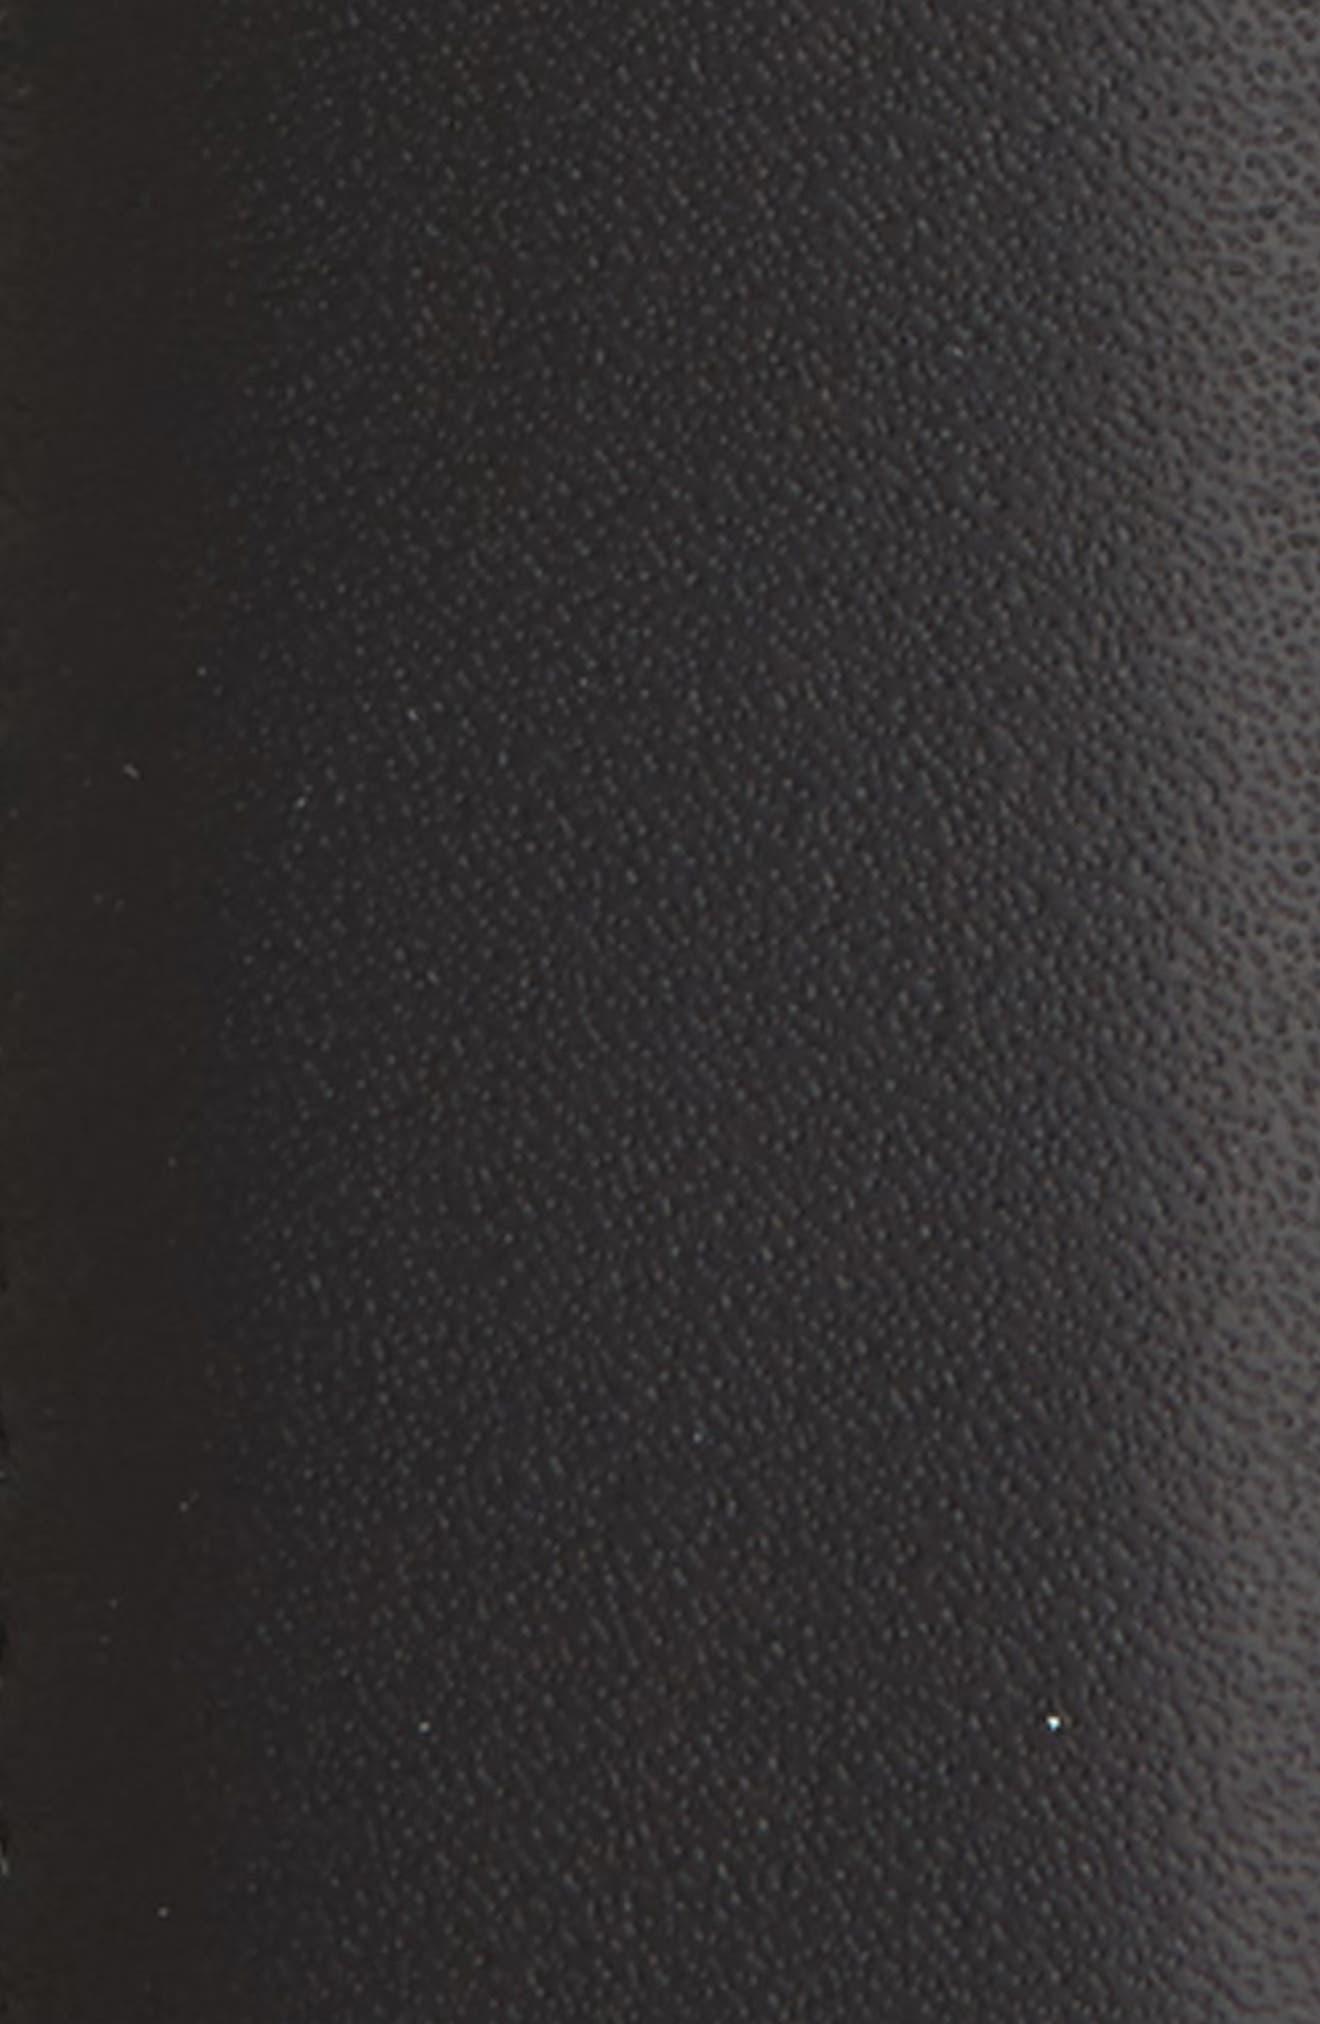 Square Buckle Reversible Leather Belt,                             Alternate thumbnail 3, color,                             BLACK/ BROWN